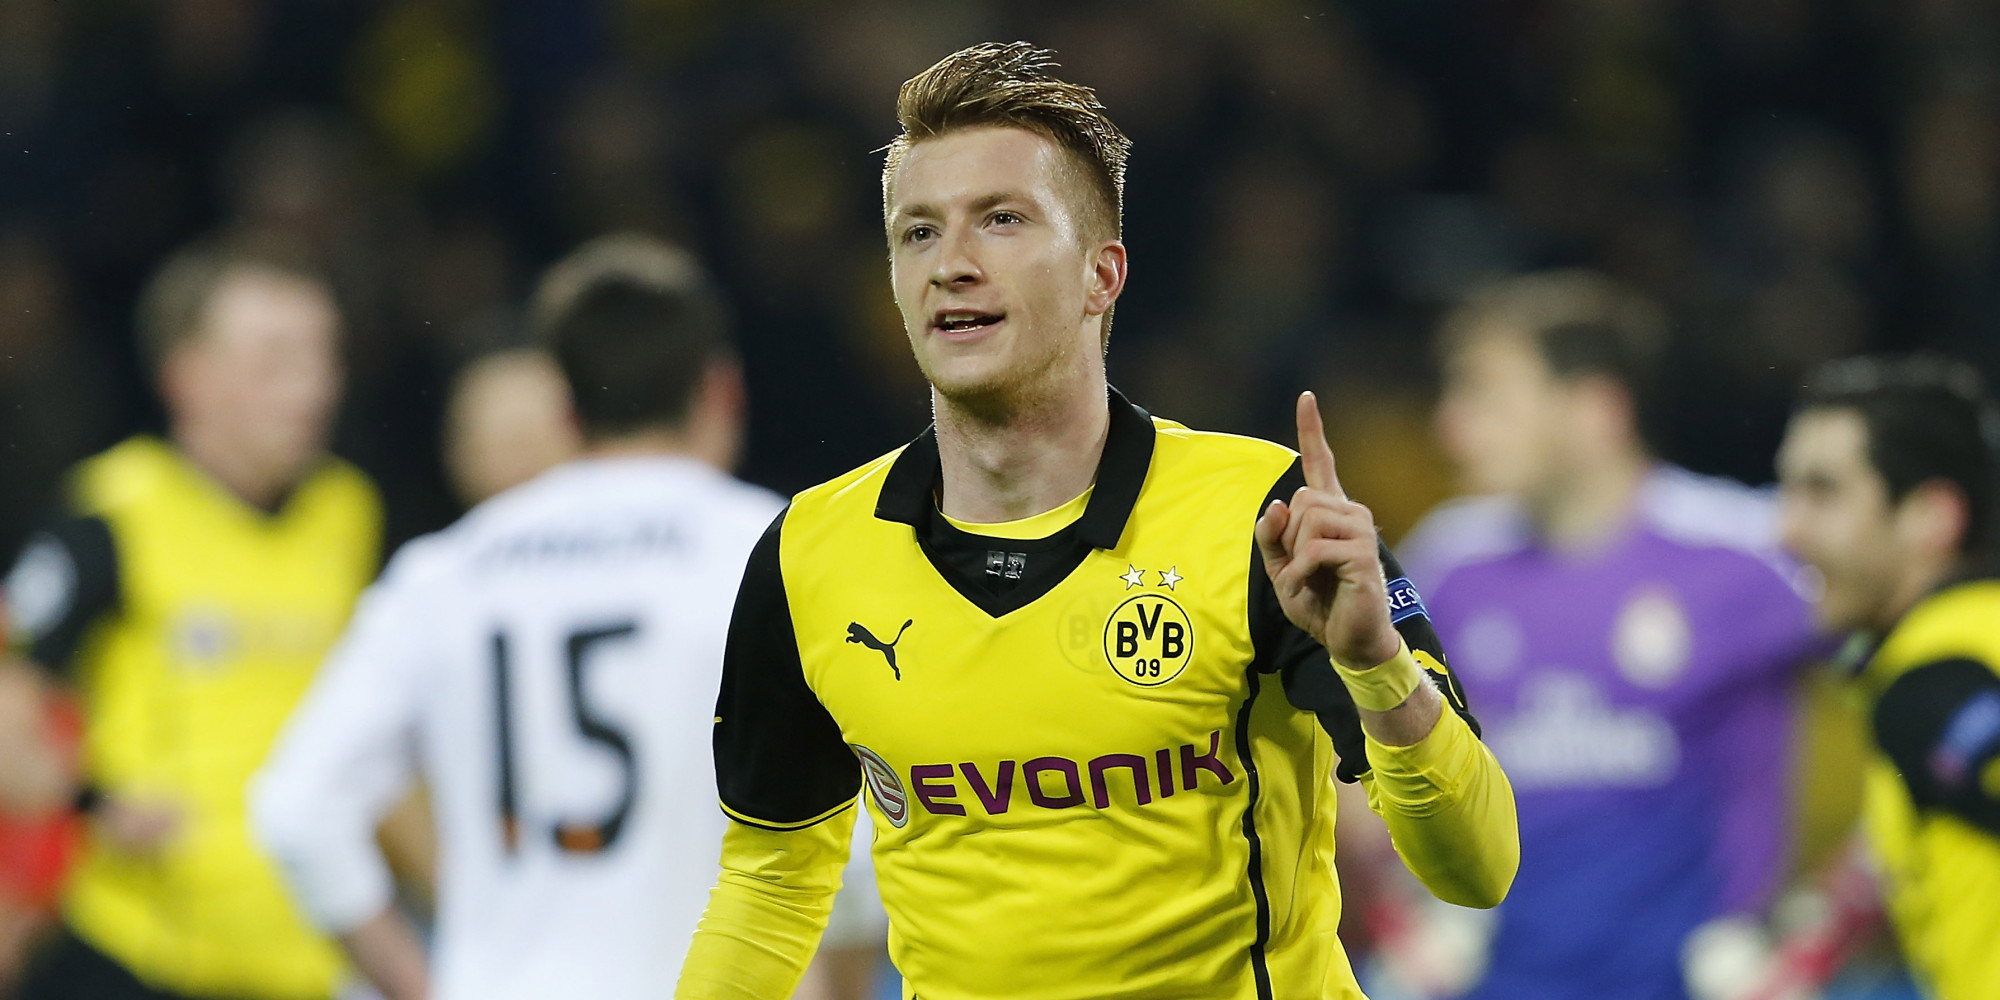 Borussia Dortmund - Marco Reus